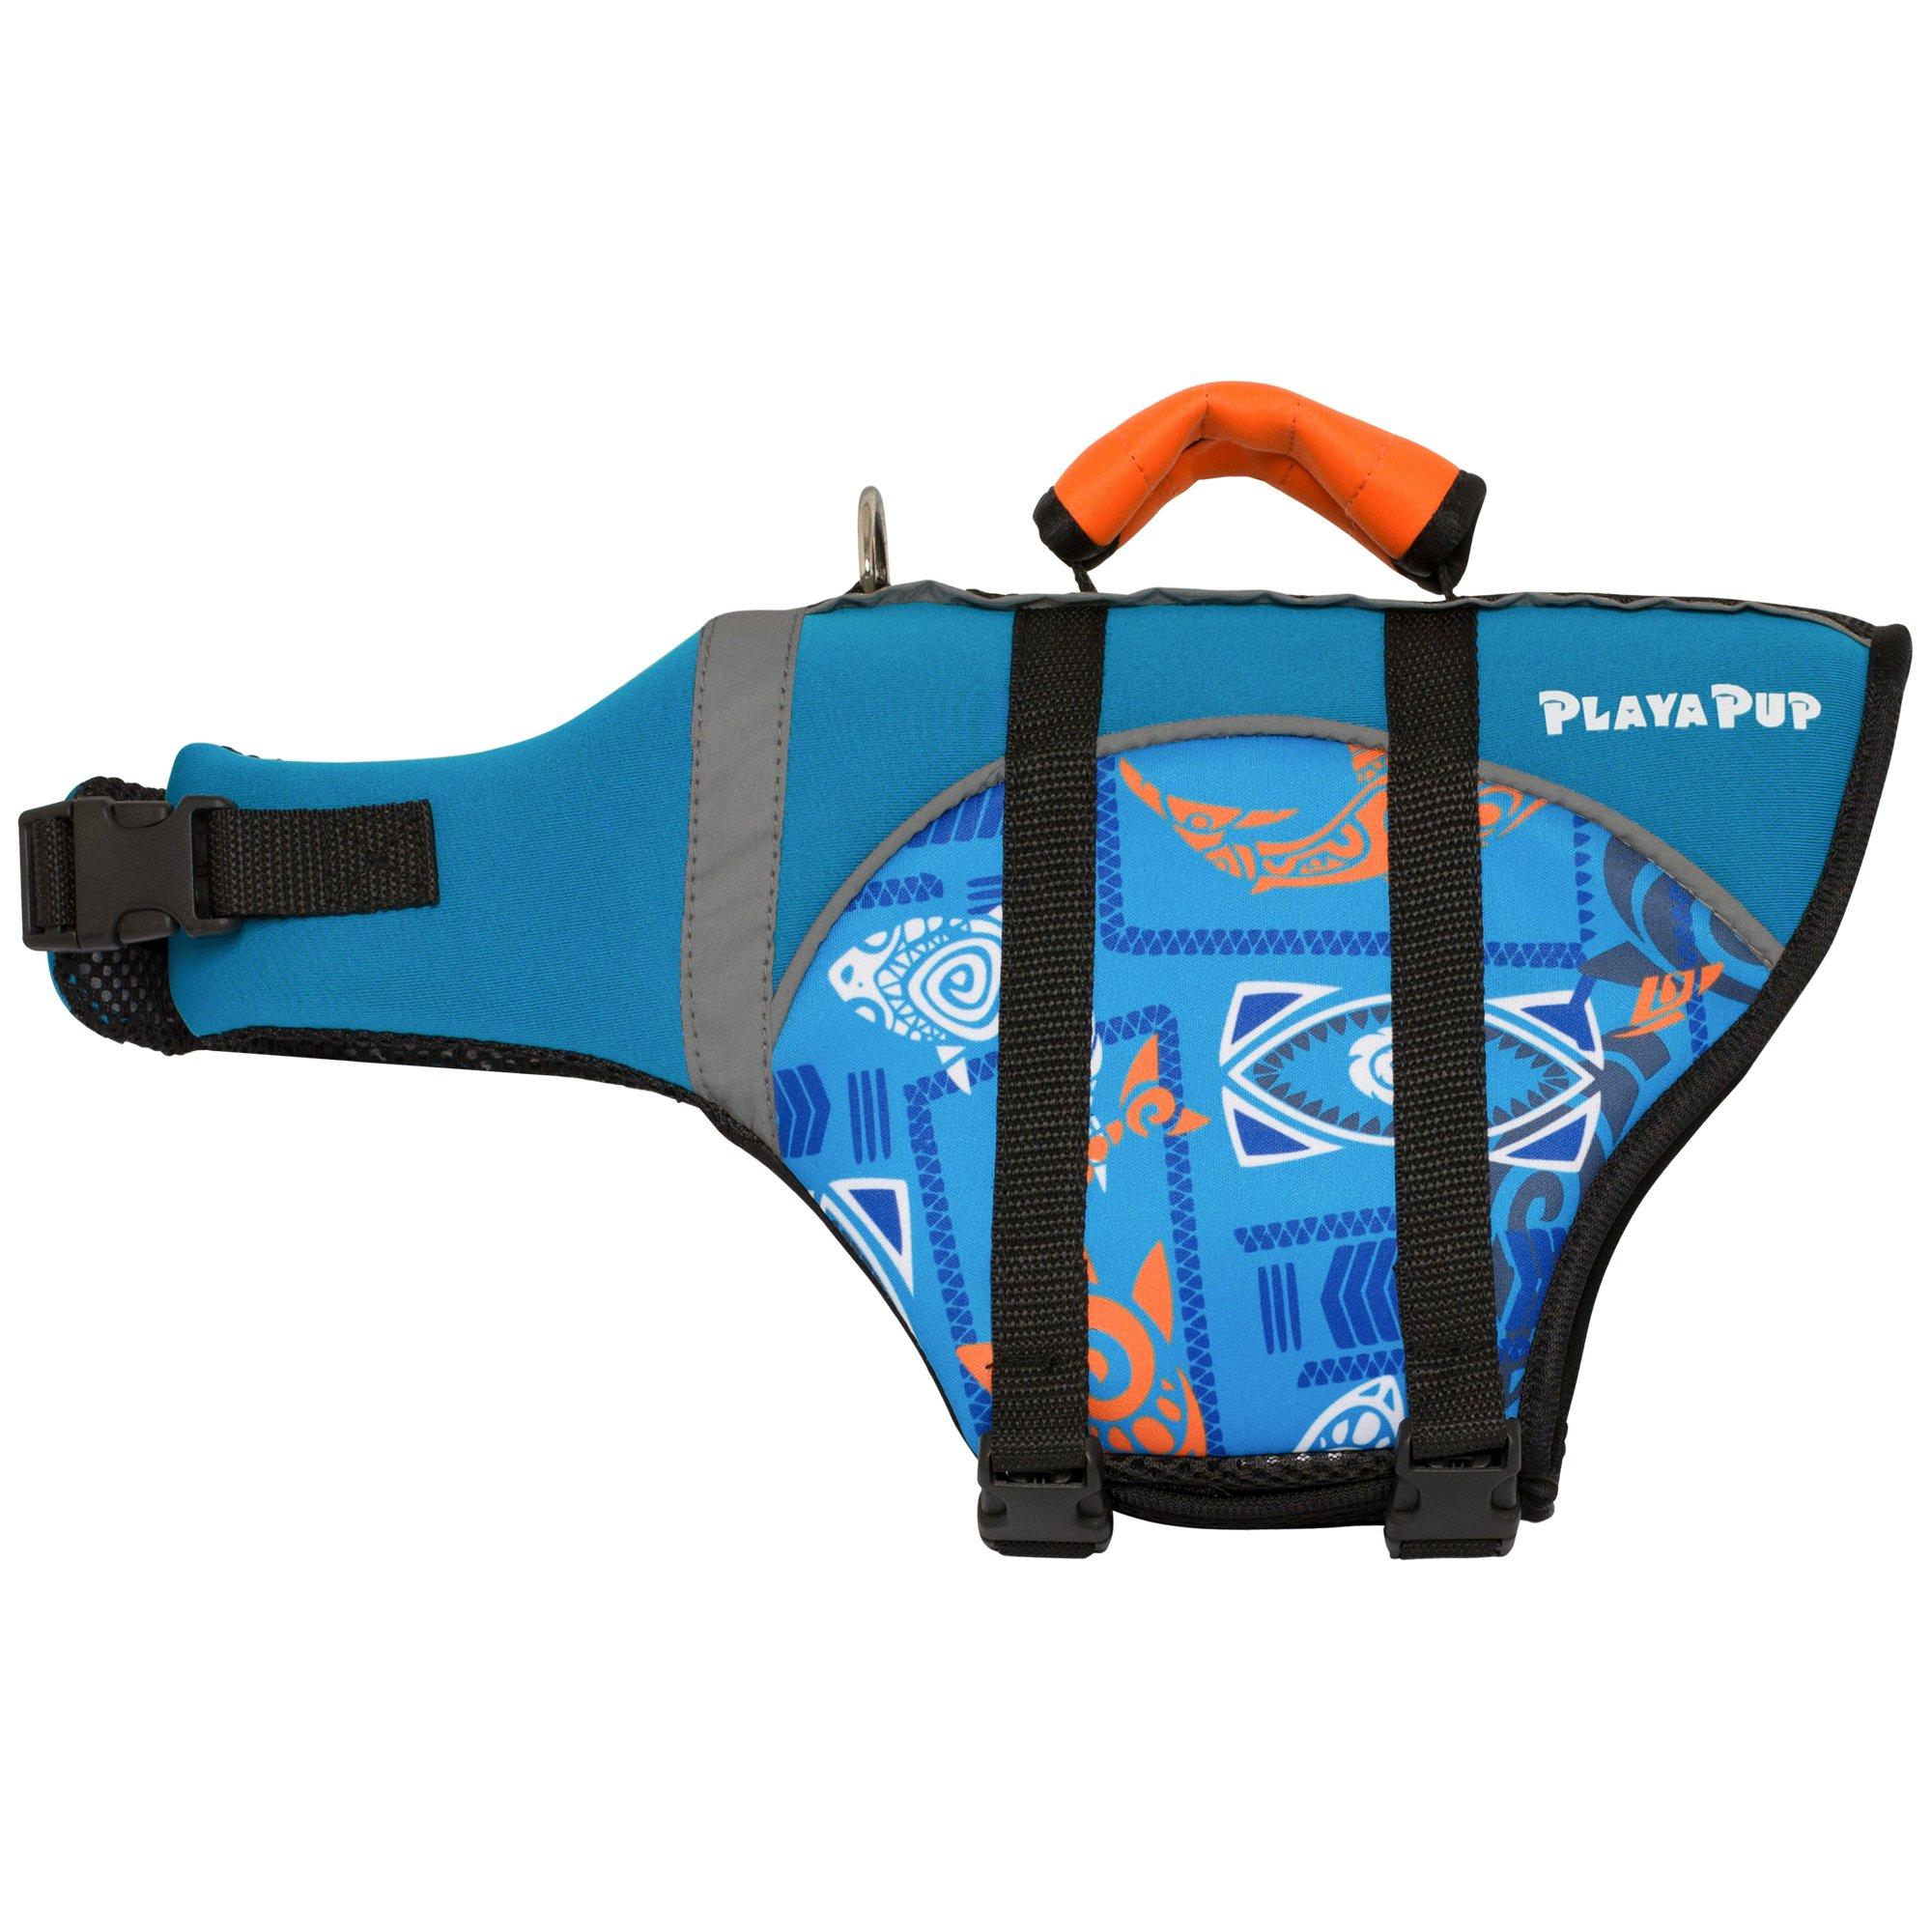 Image of Playa Pup Pet Flotation Vest Blue Shark, XX-Large, Blue / Orange